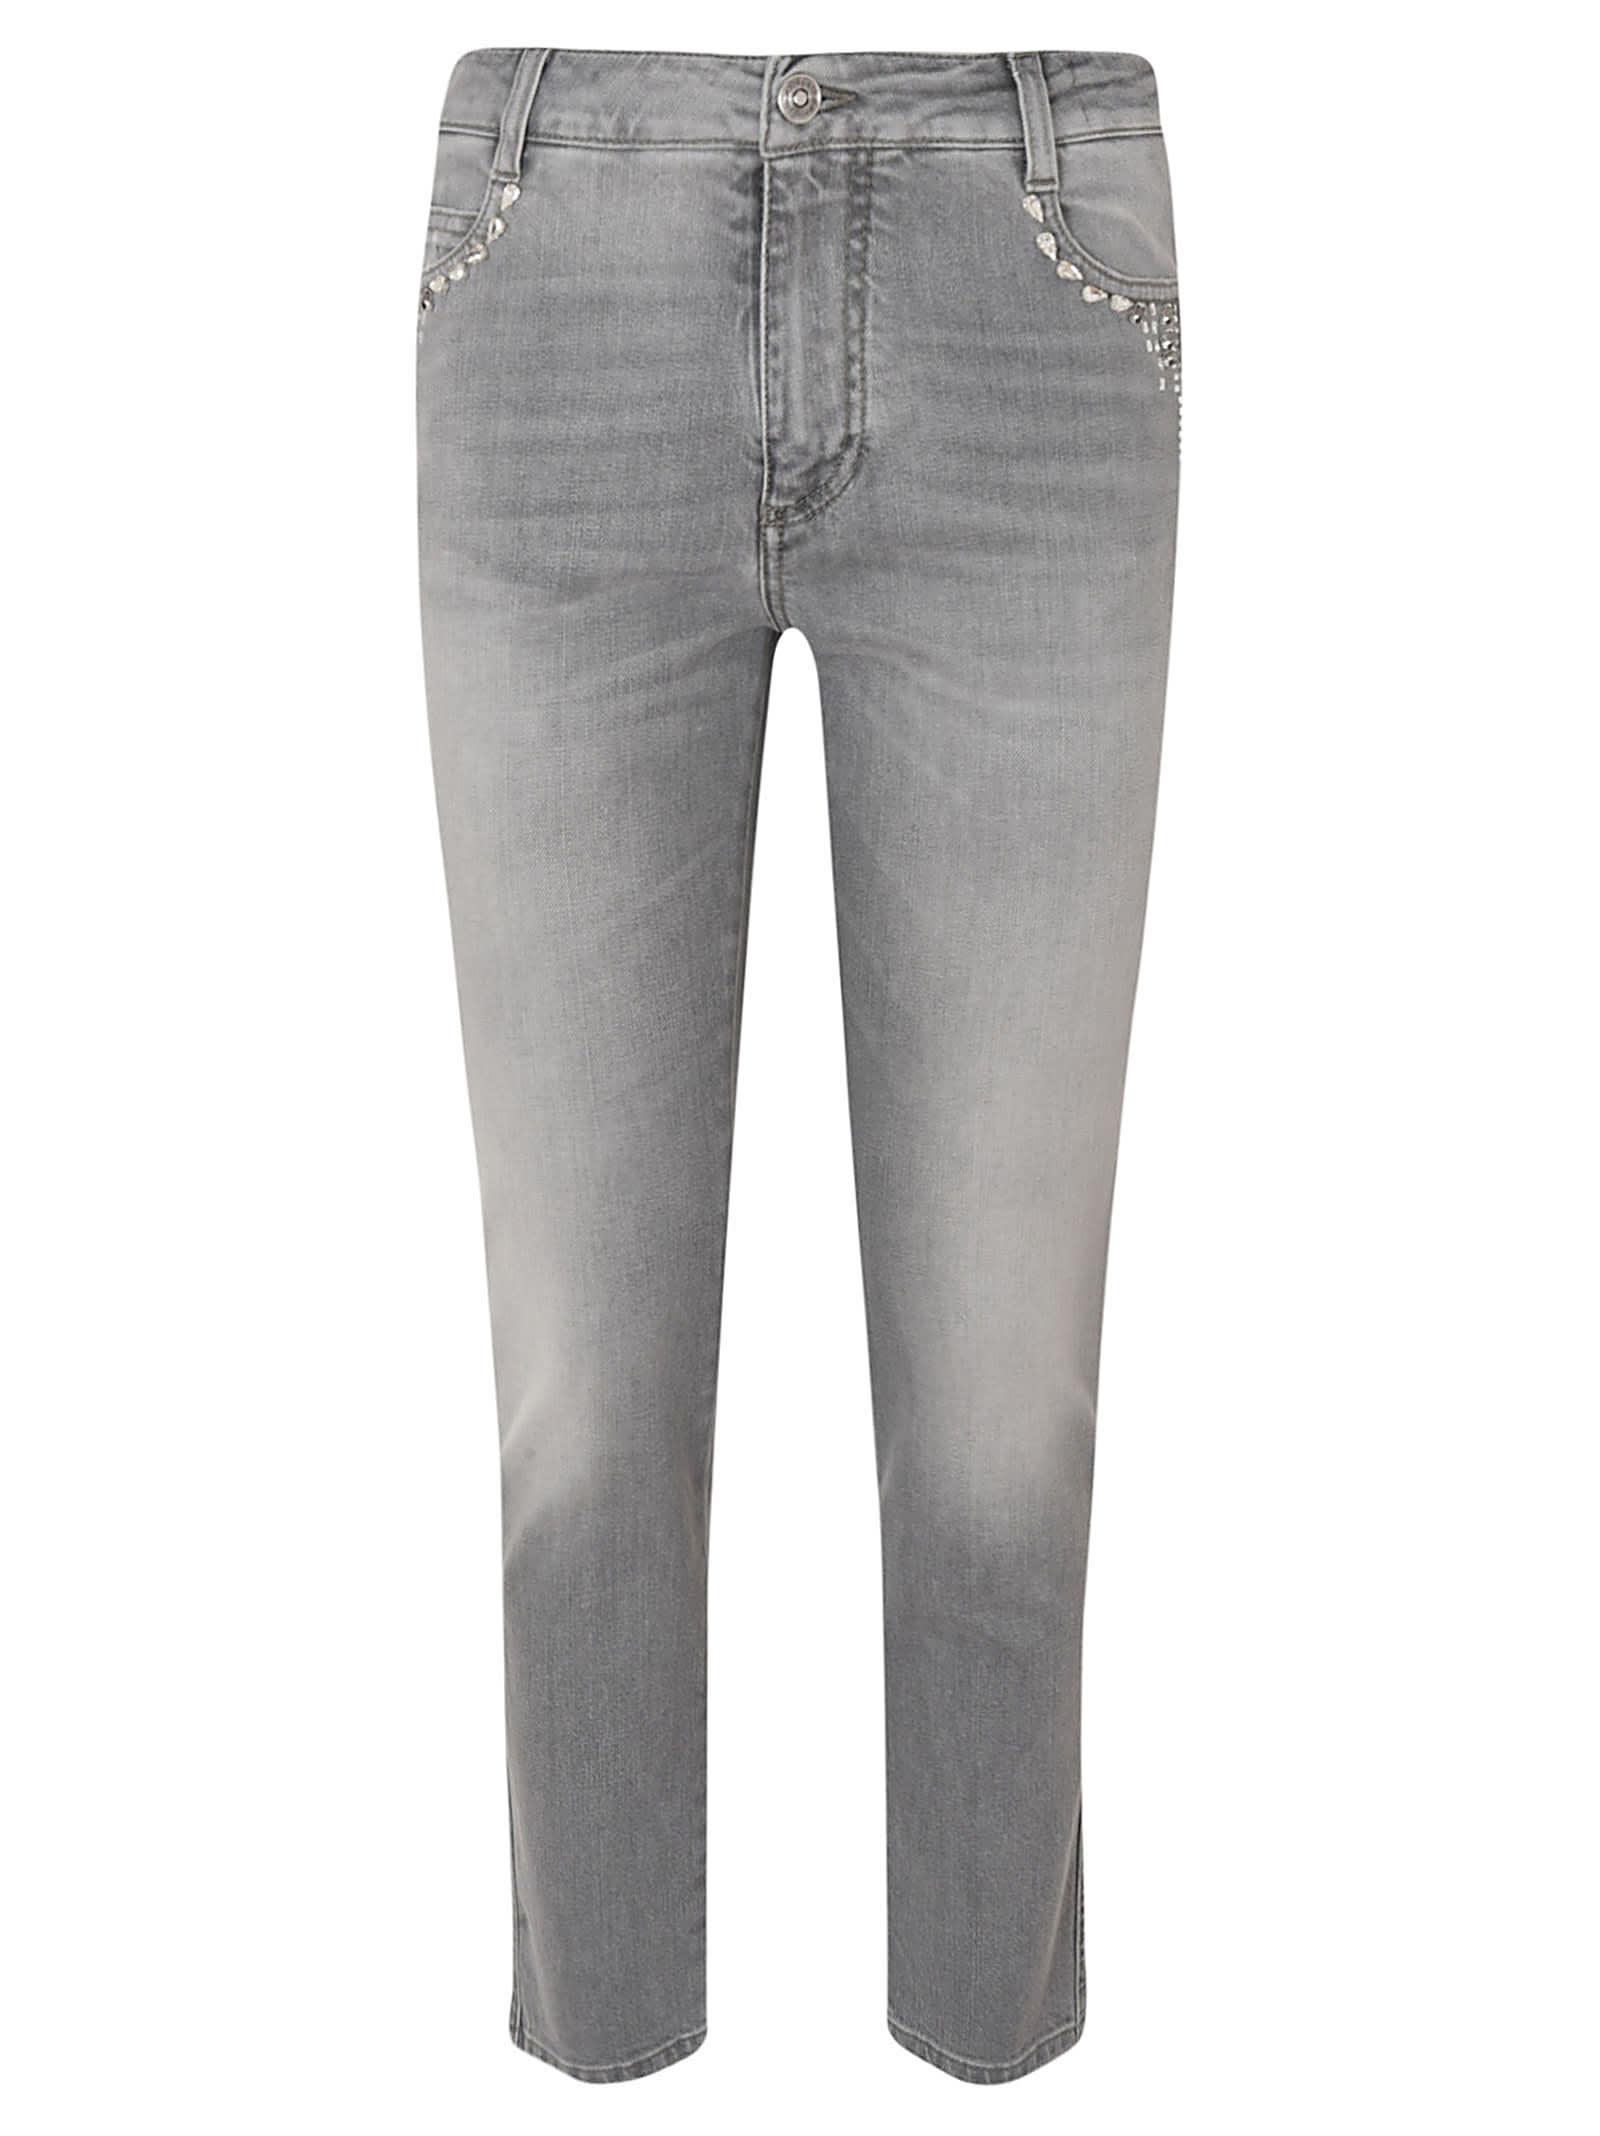 Ermanno Scervino Slim Fit Jeans